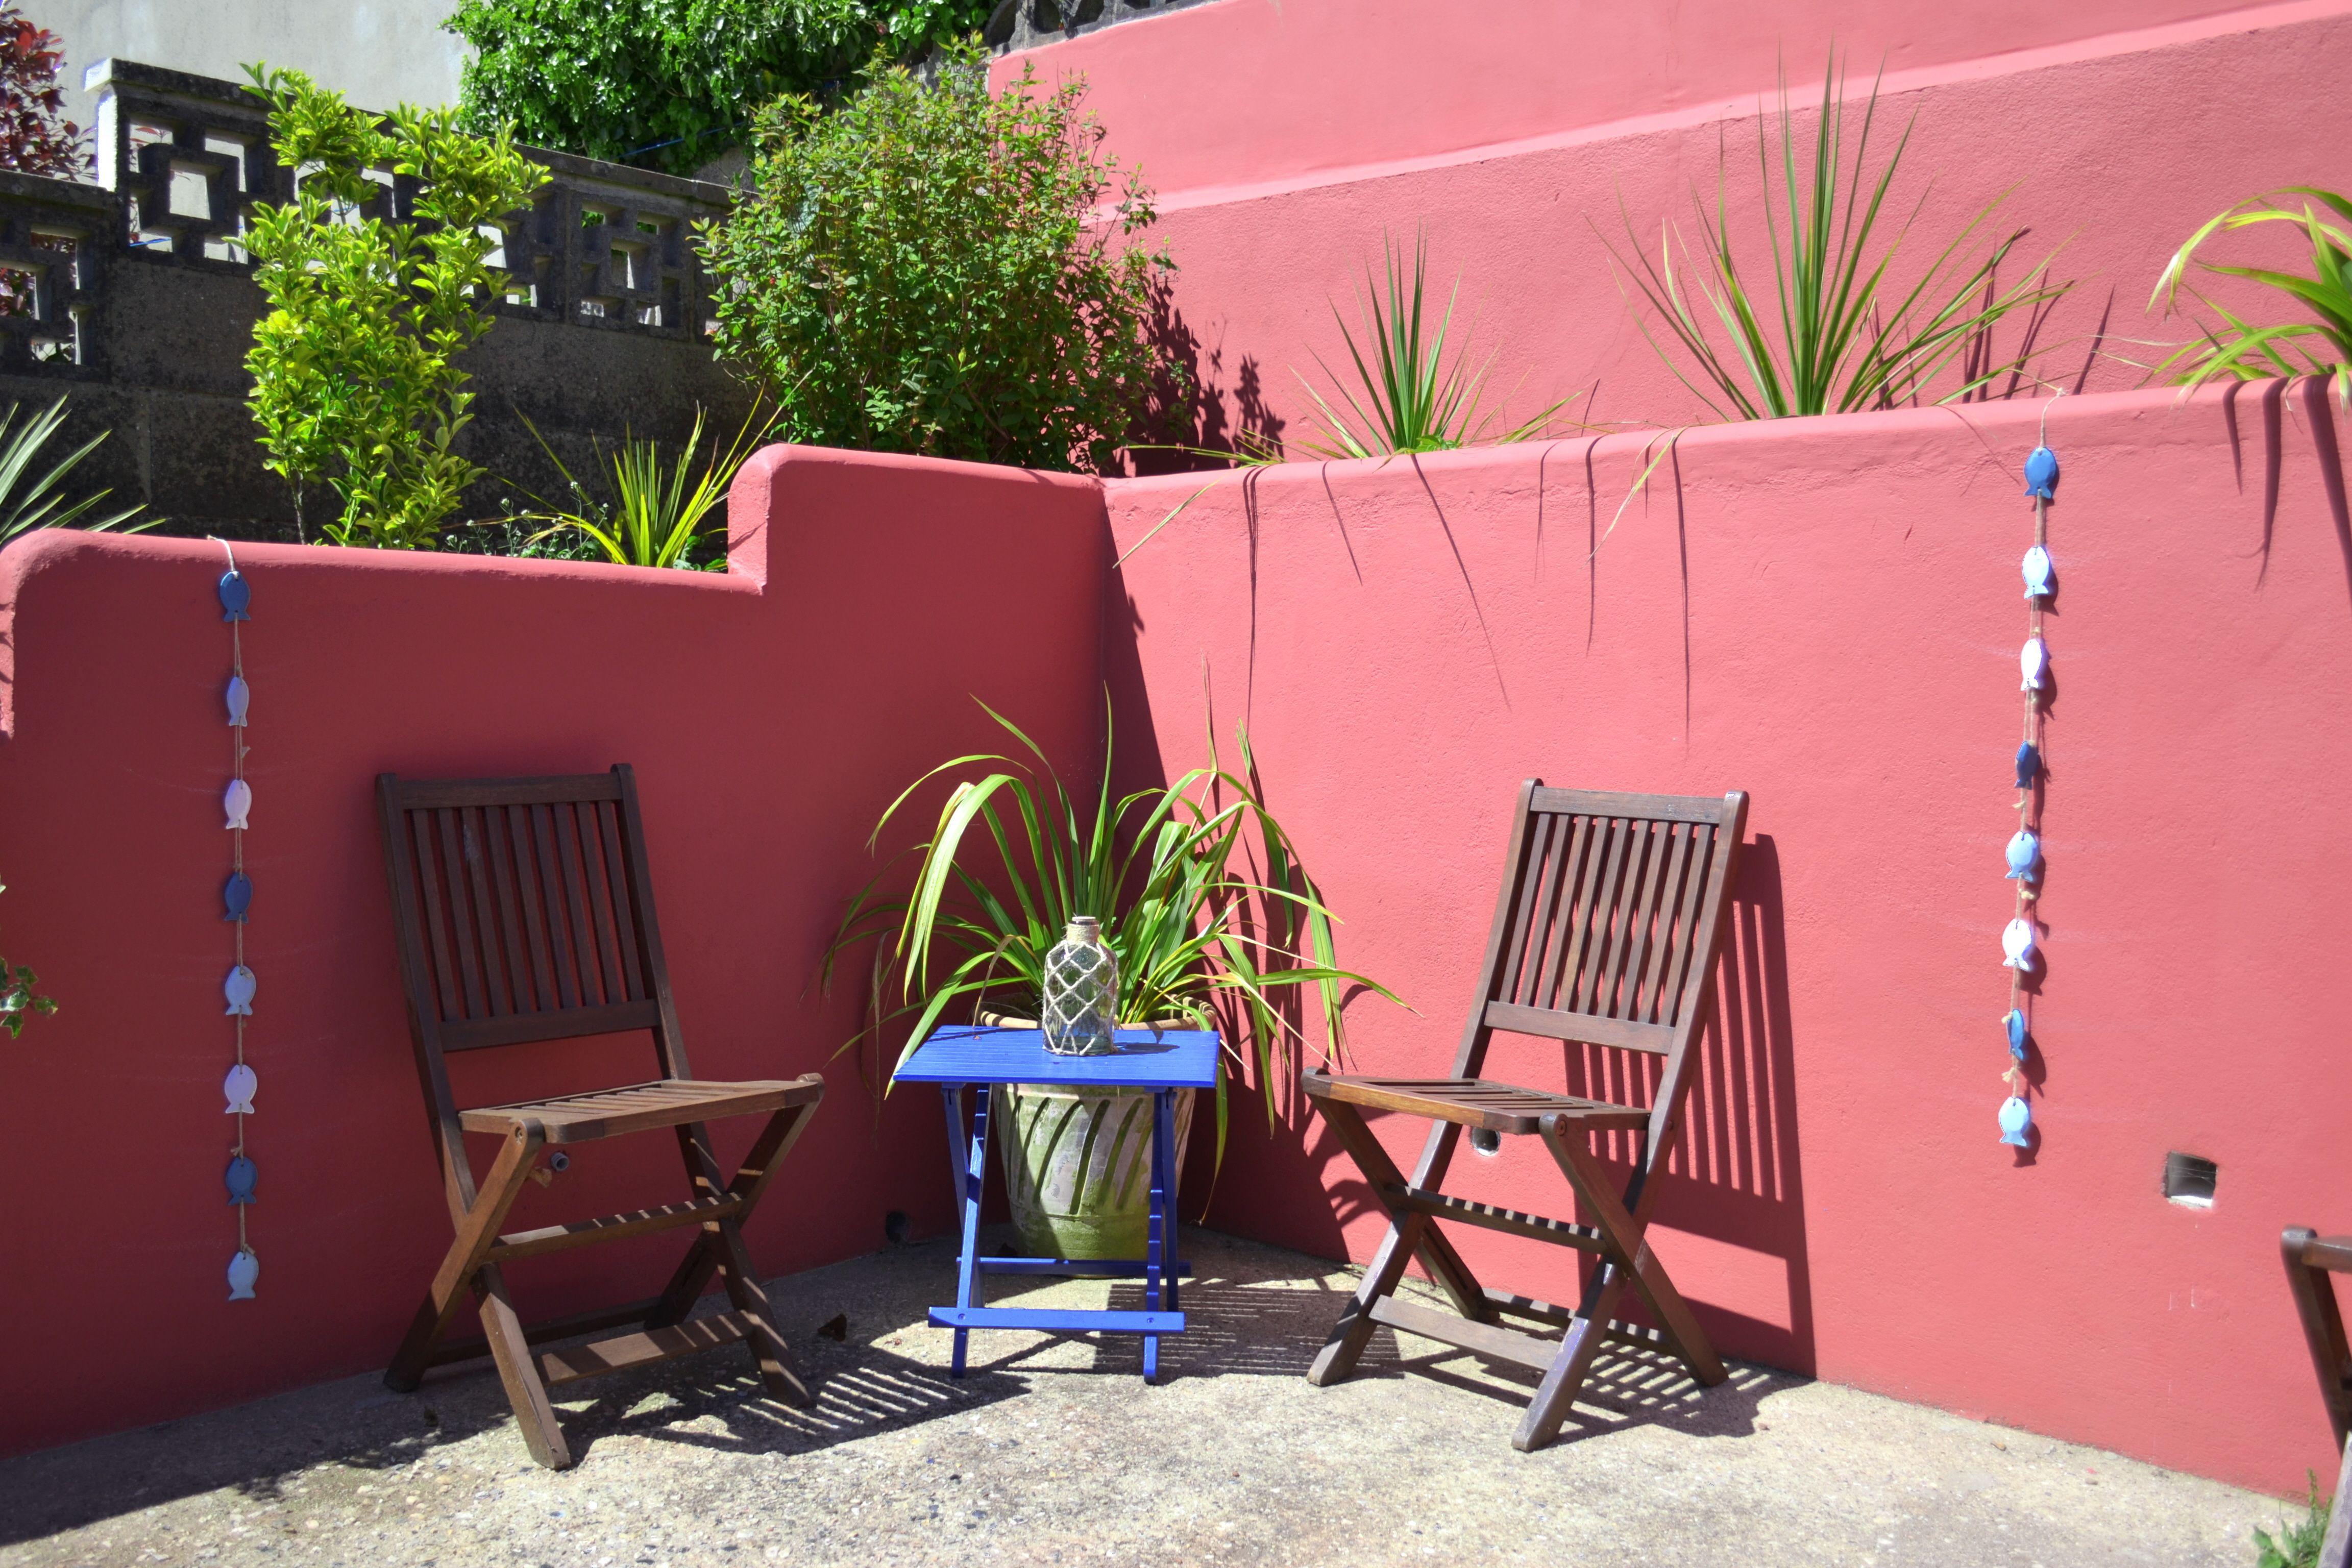 Mediterranean style courtyard garden with terracotta painted walls ...